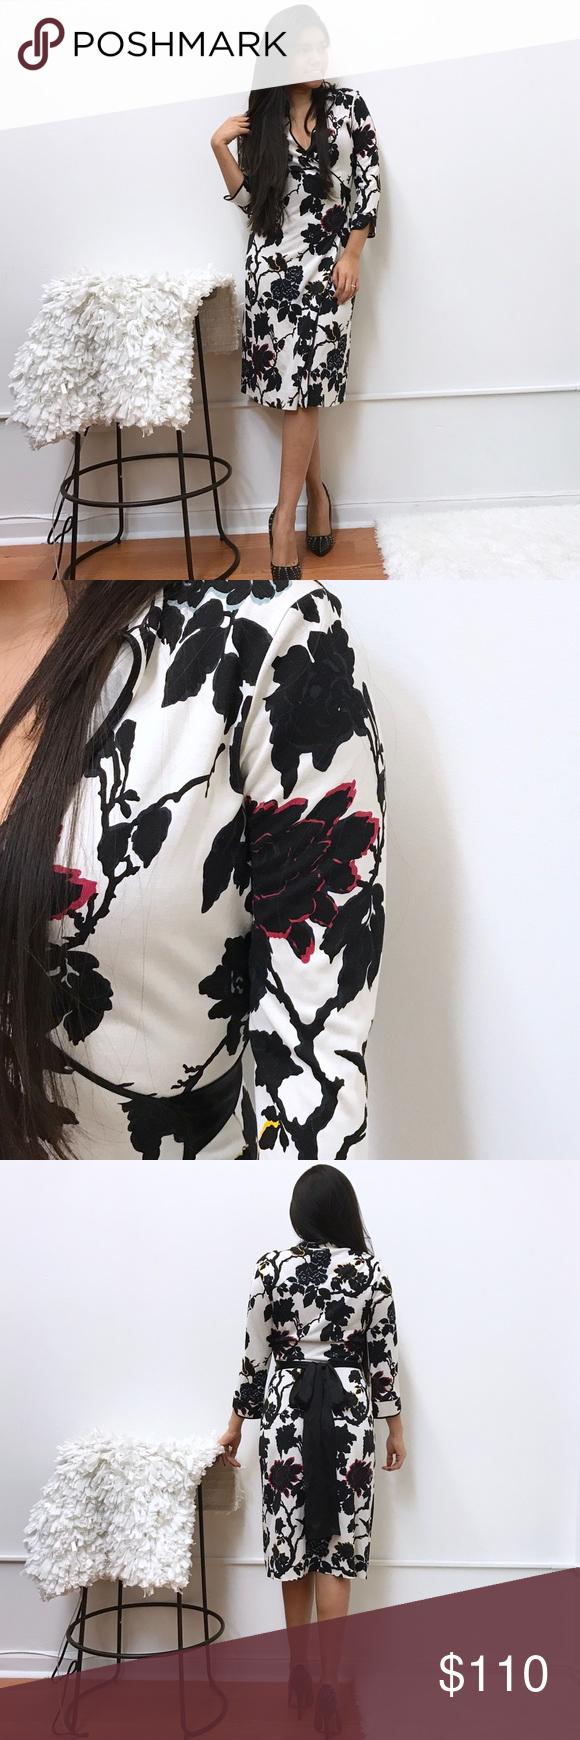 "DVF Floral wrap dress sz 4 DVF dress. Sz 4. Great condition. Length 40"" Diane von Furstenberg Dresses"